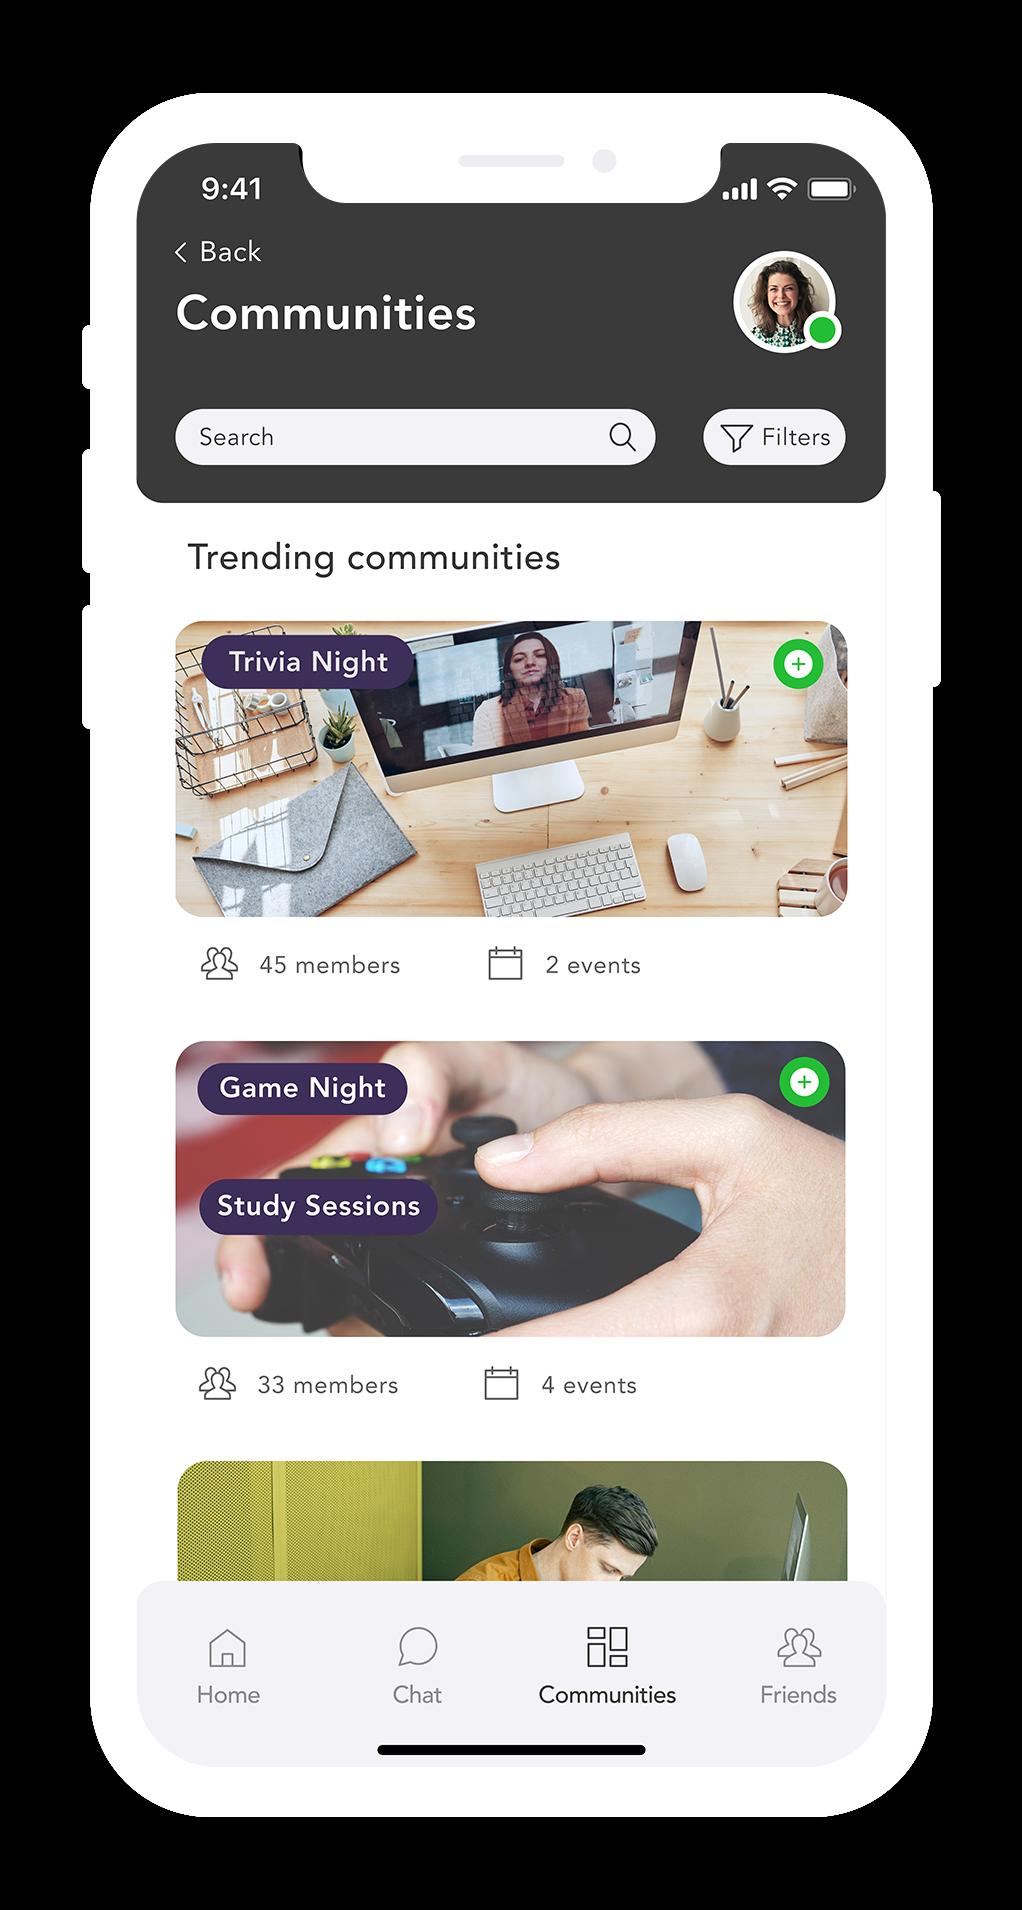 cc-communities